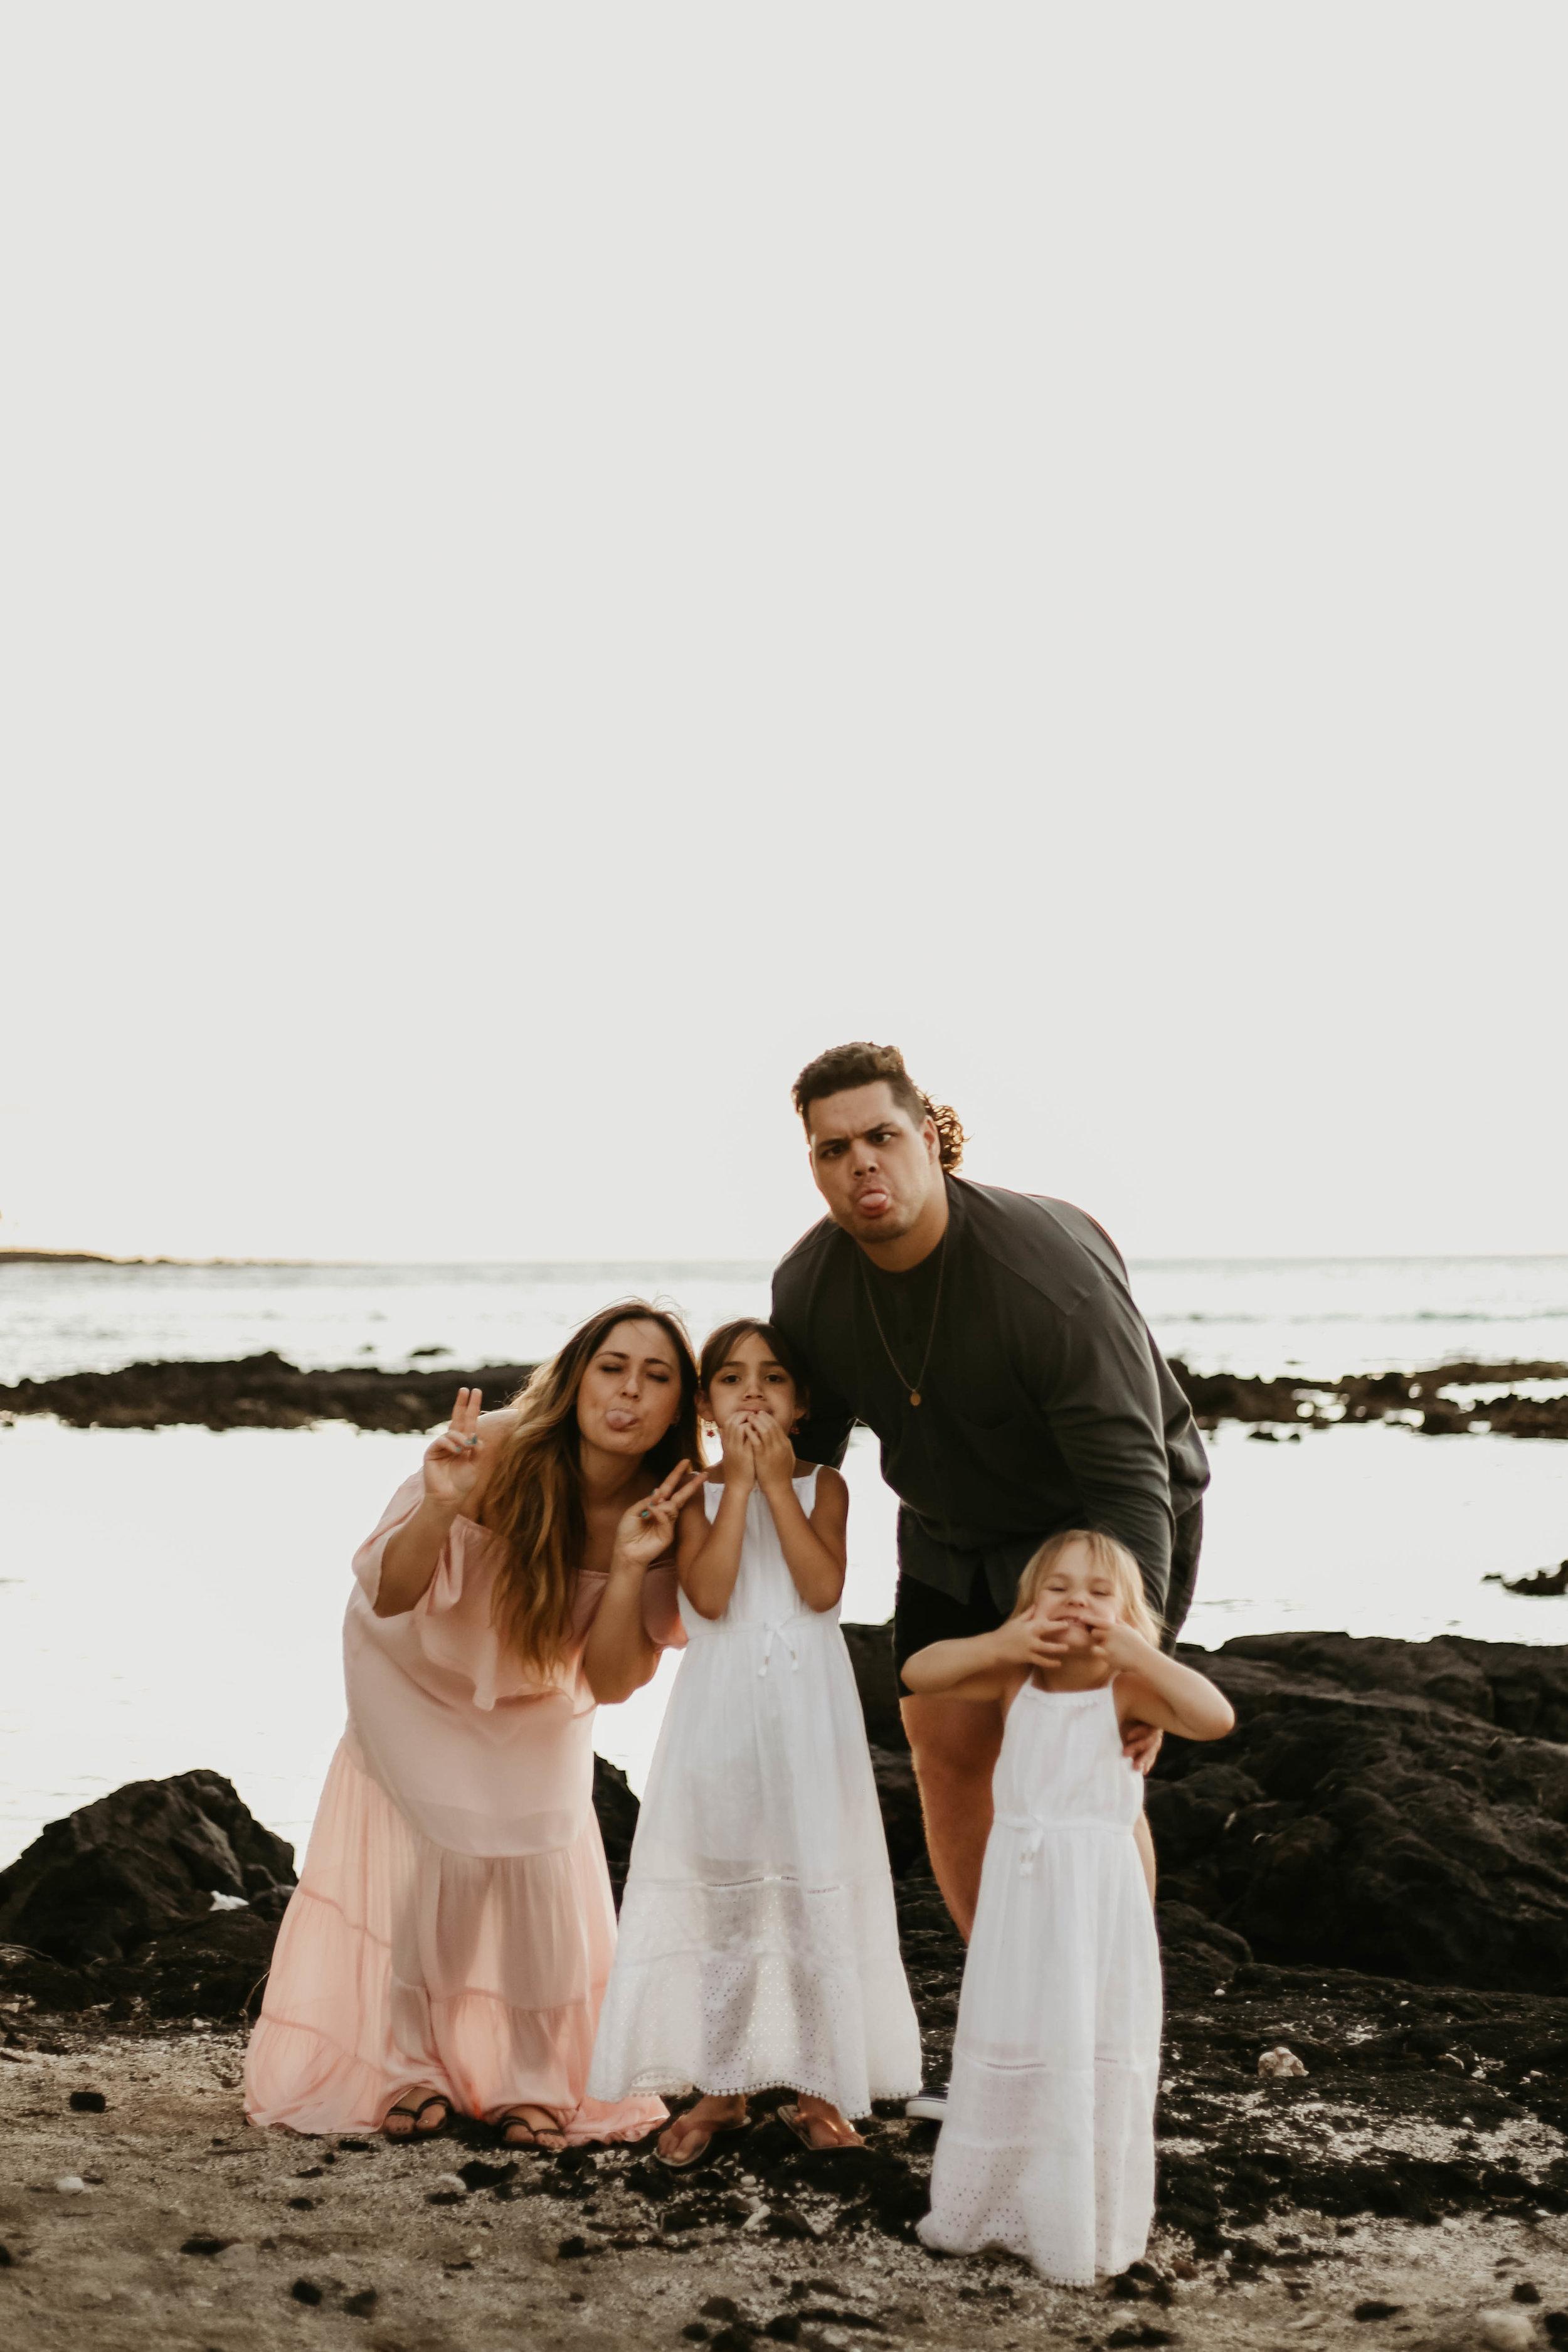 familyphotosmaybe4.jpg